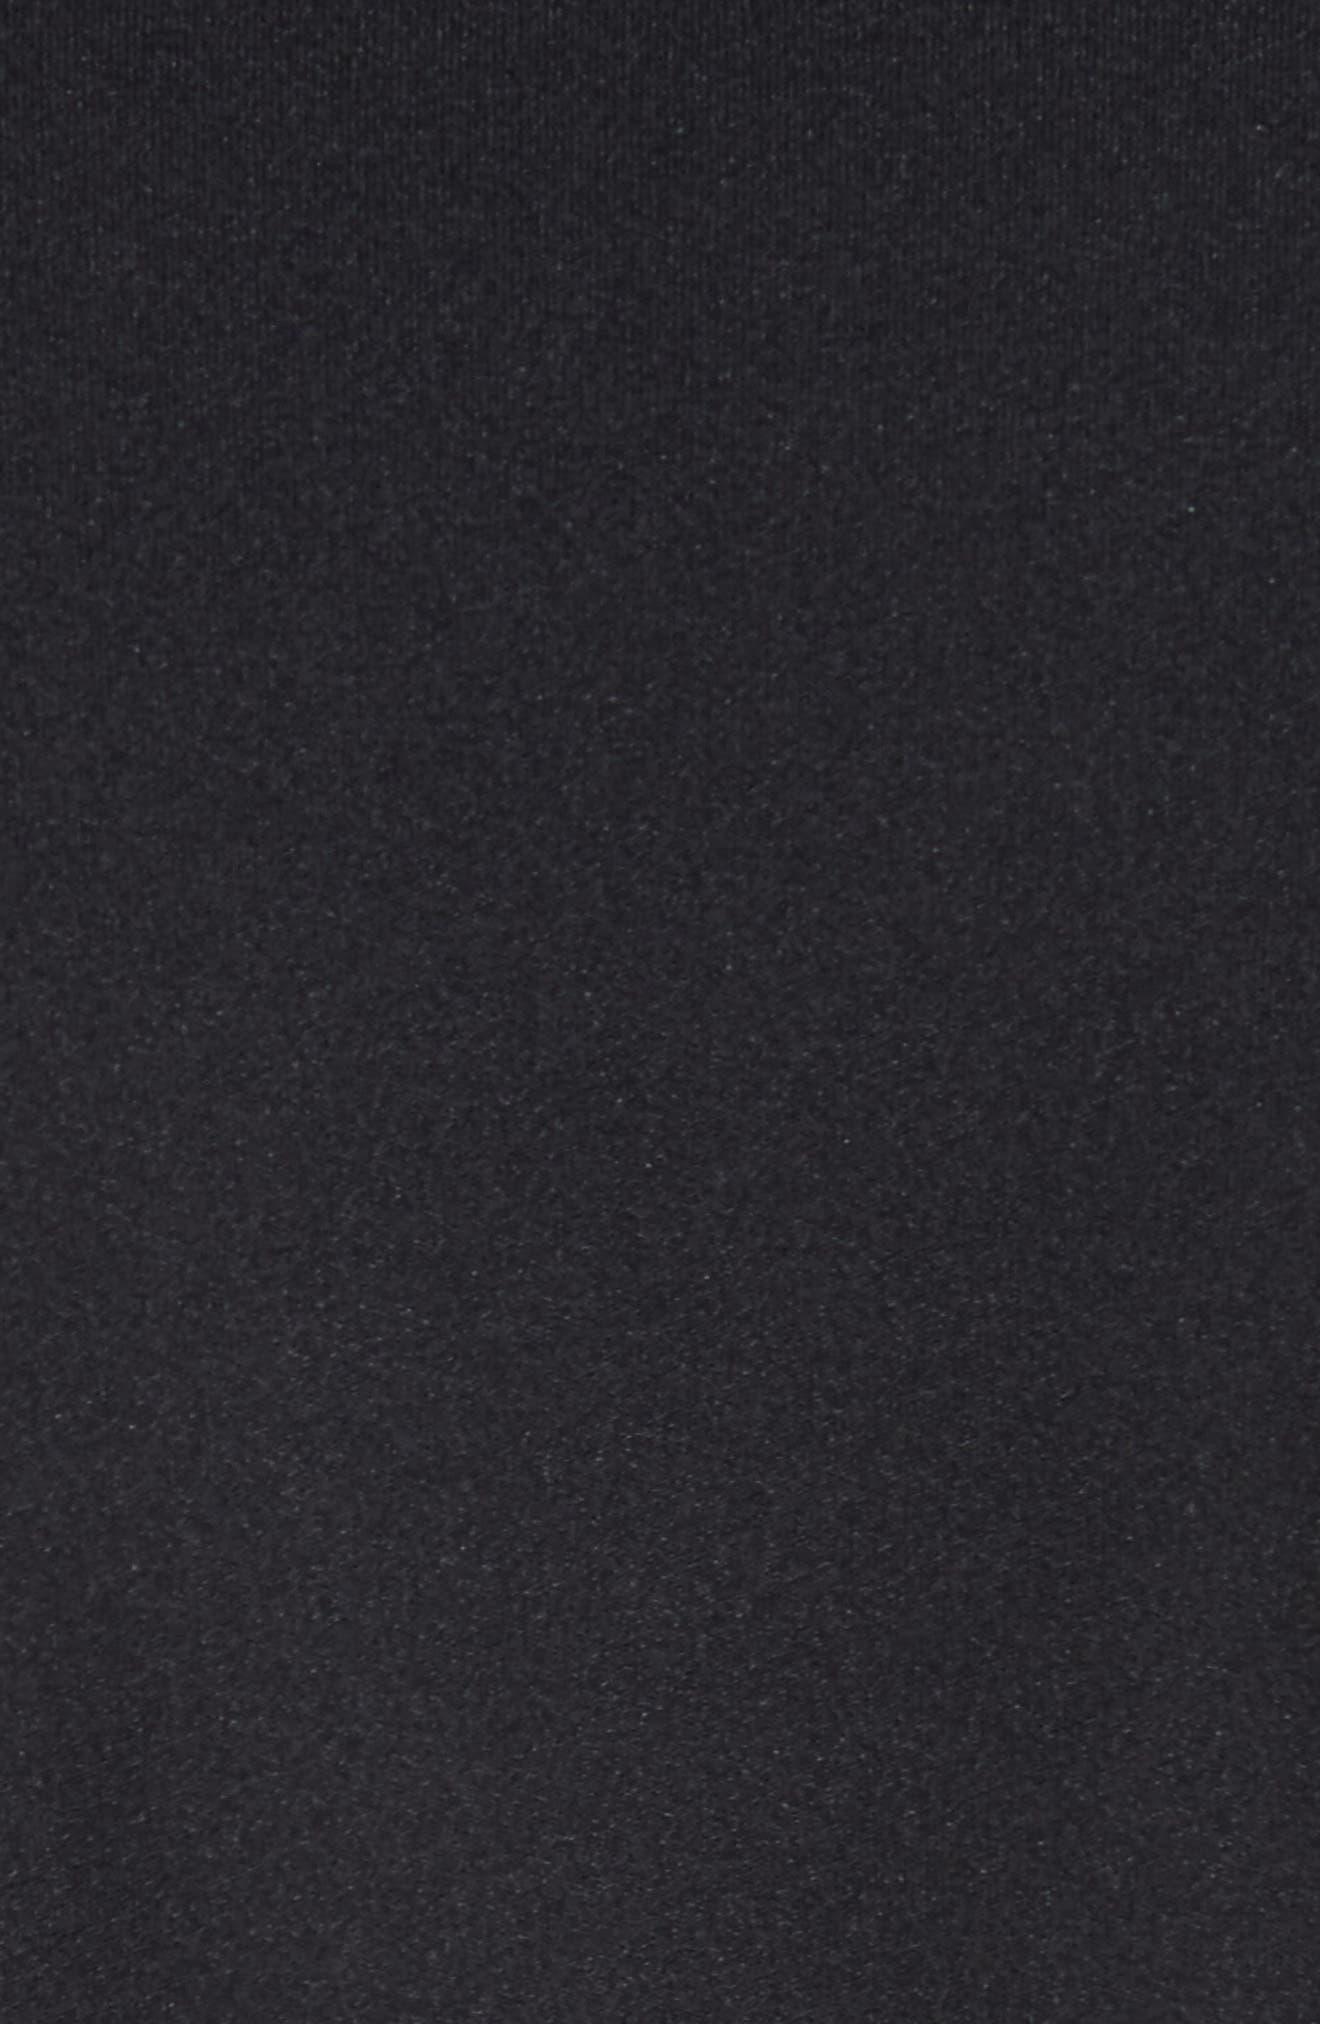 Ruffle Hem Tee,                             Alternate thumbnail 5, color,                             Black